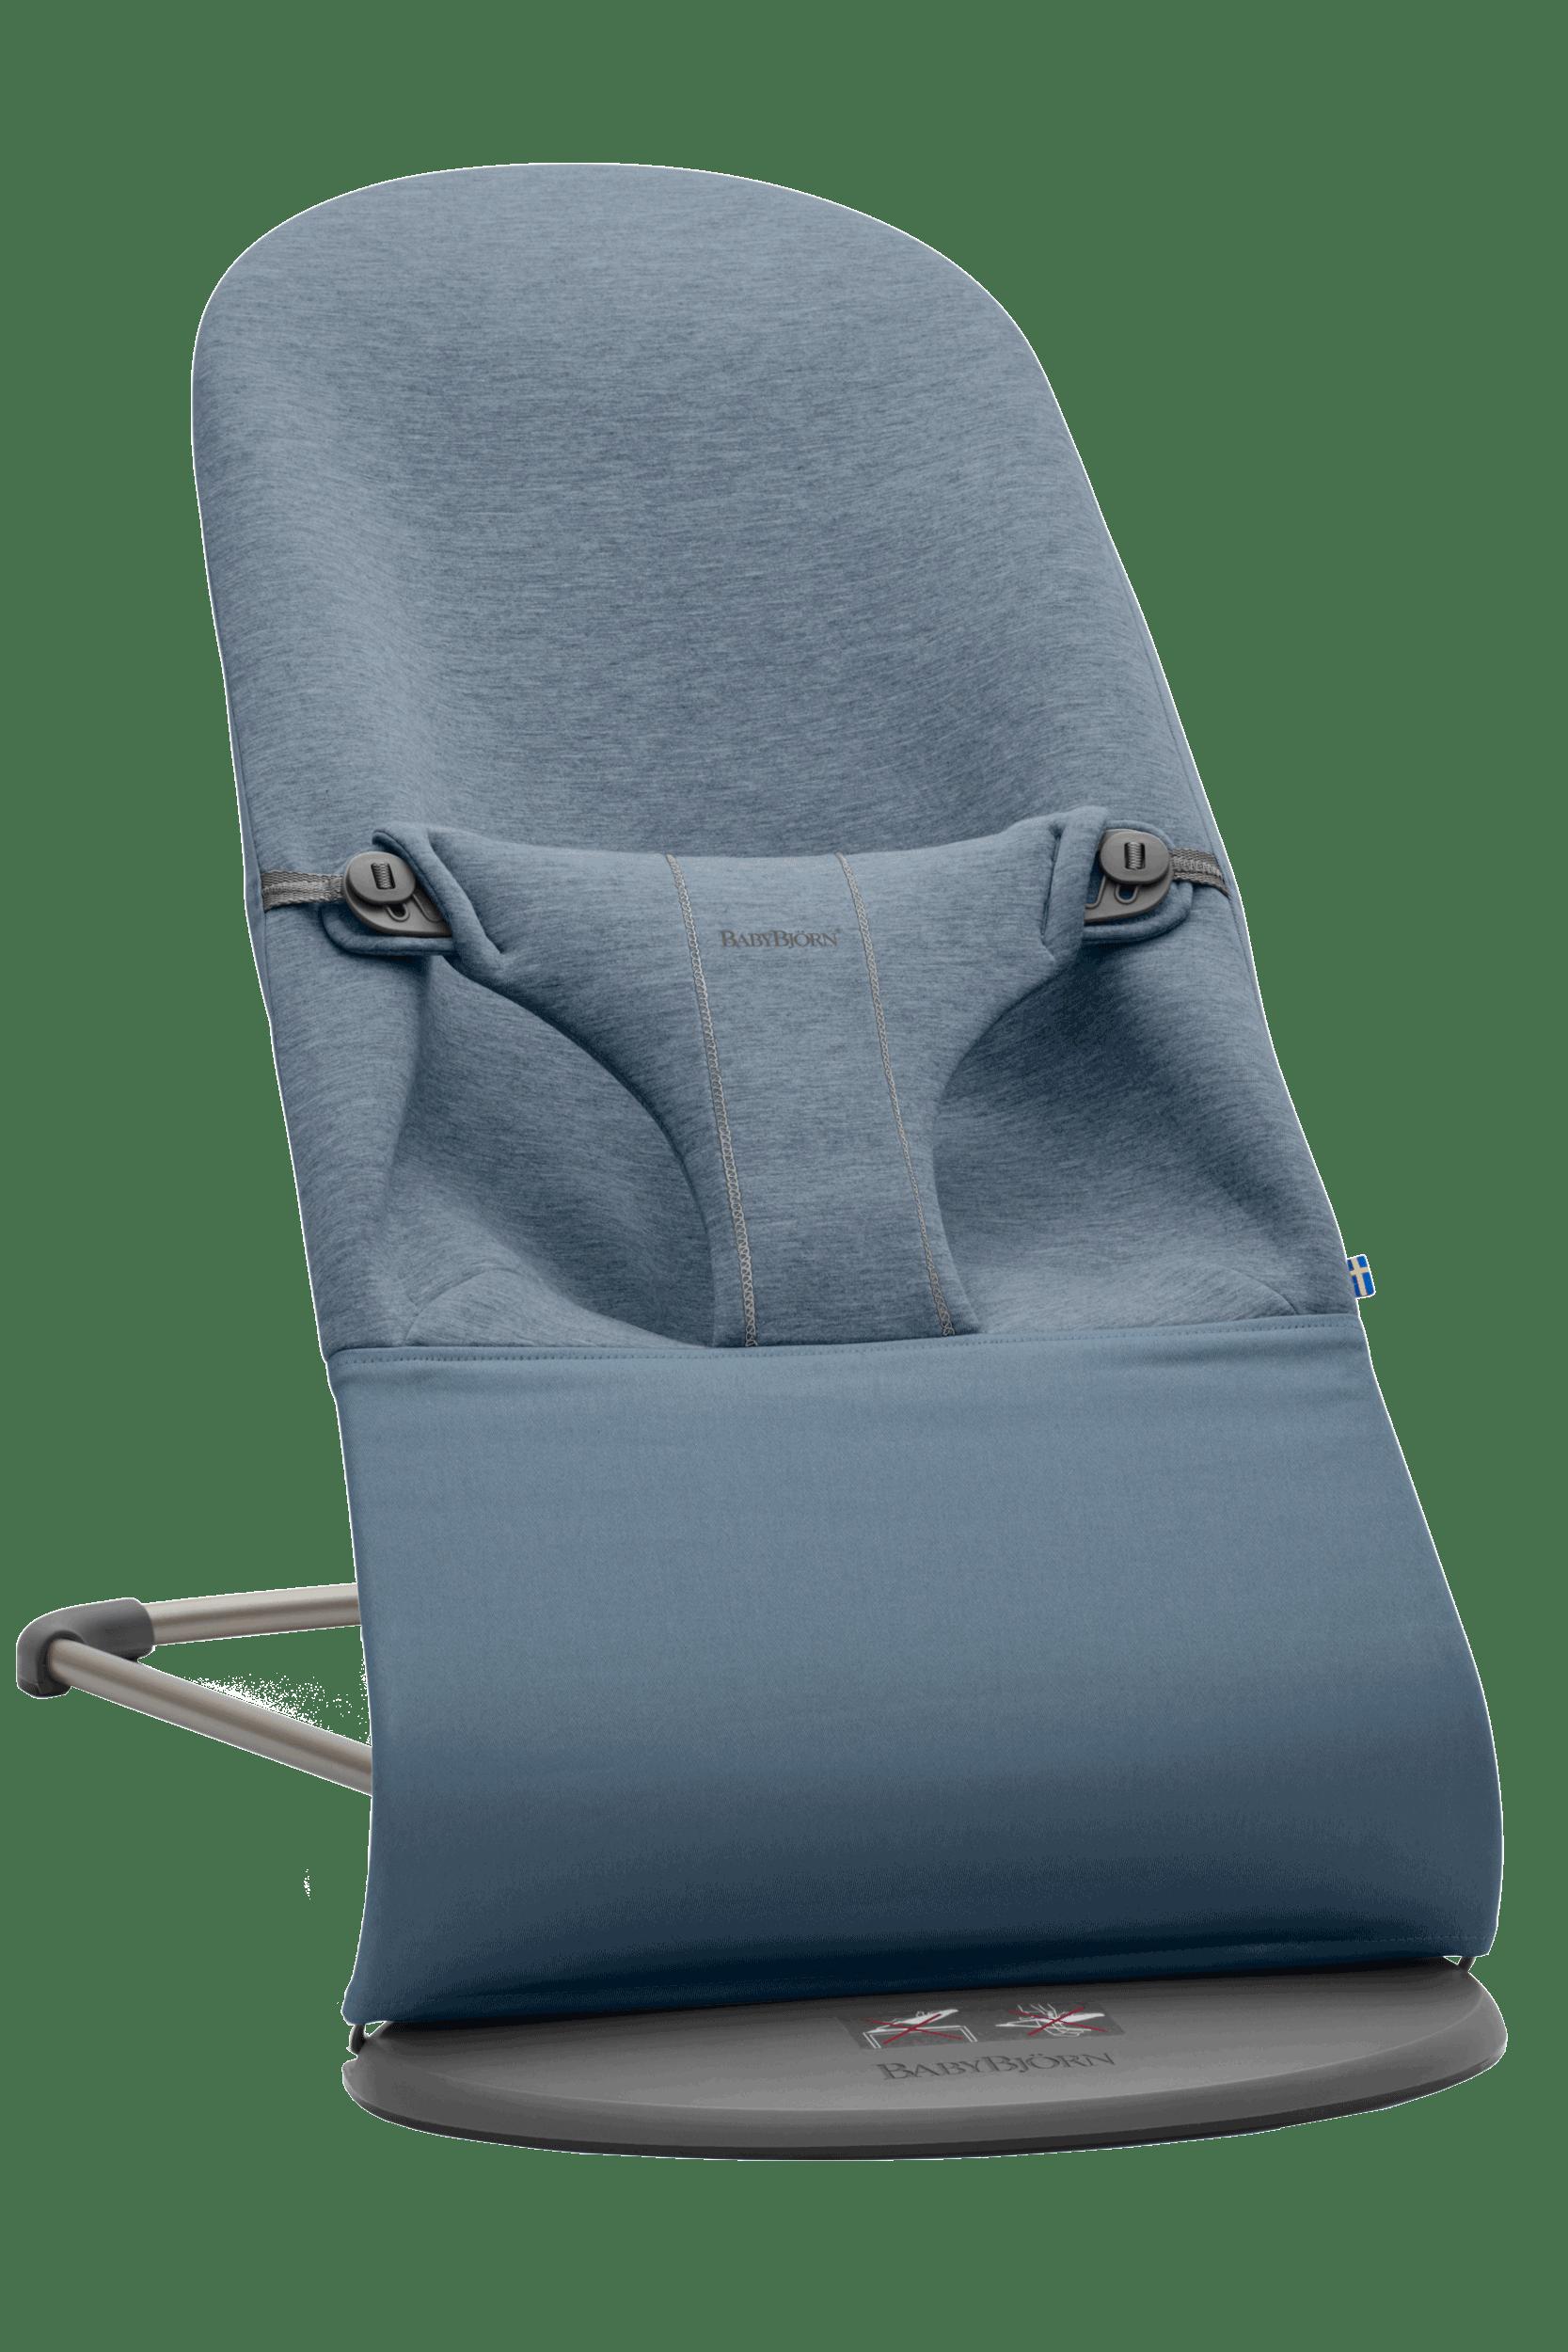 babybjorn-hamaca-bliss-azul-grisaceo-3d-jersey